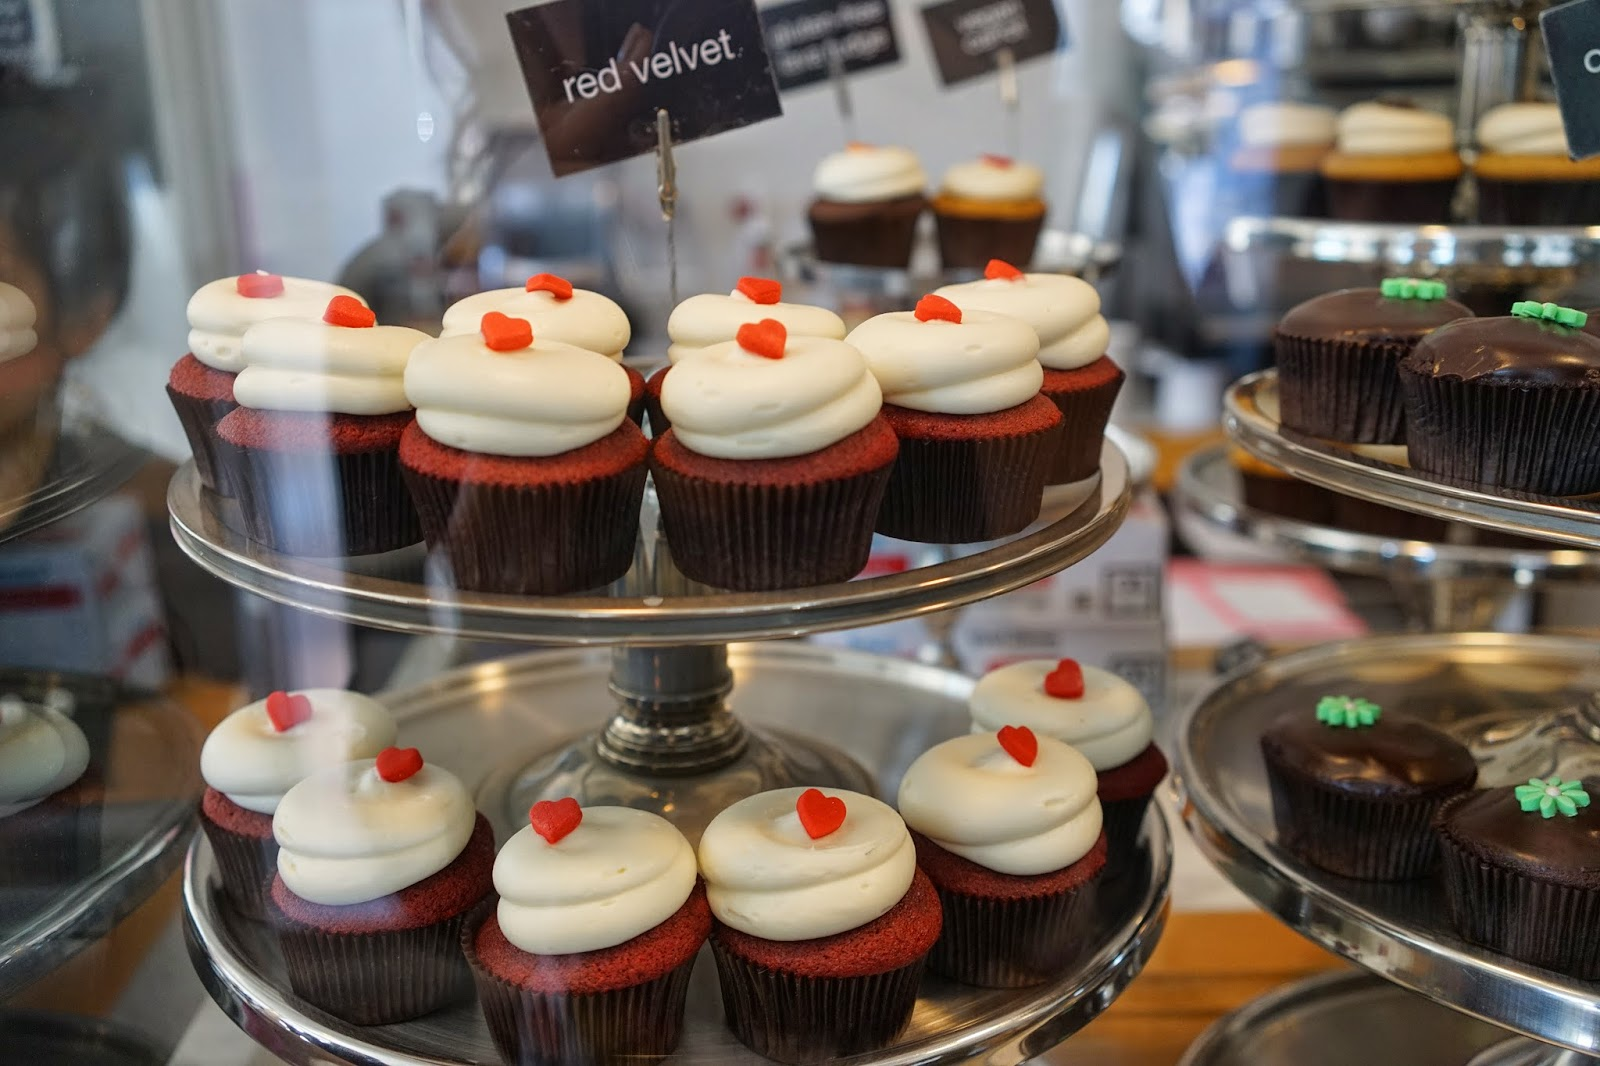 cupcakes in washington d.c